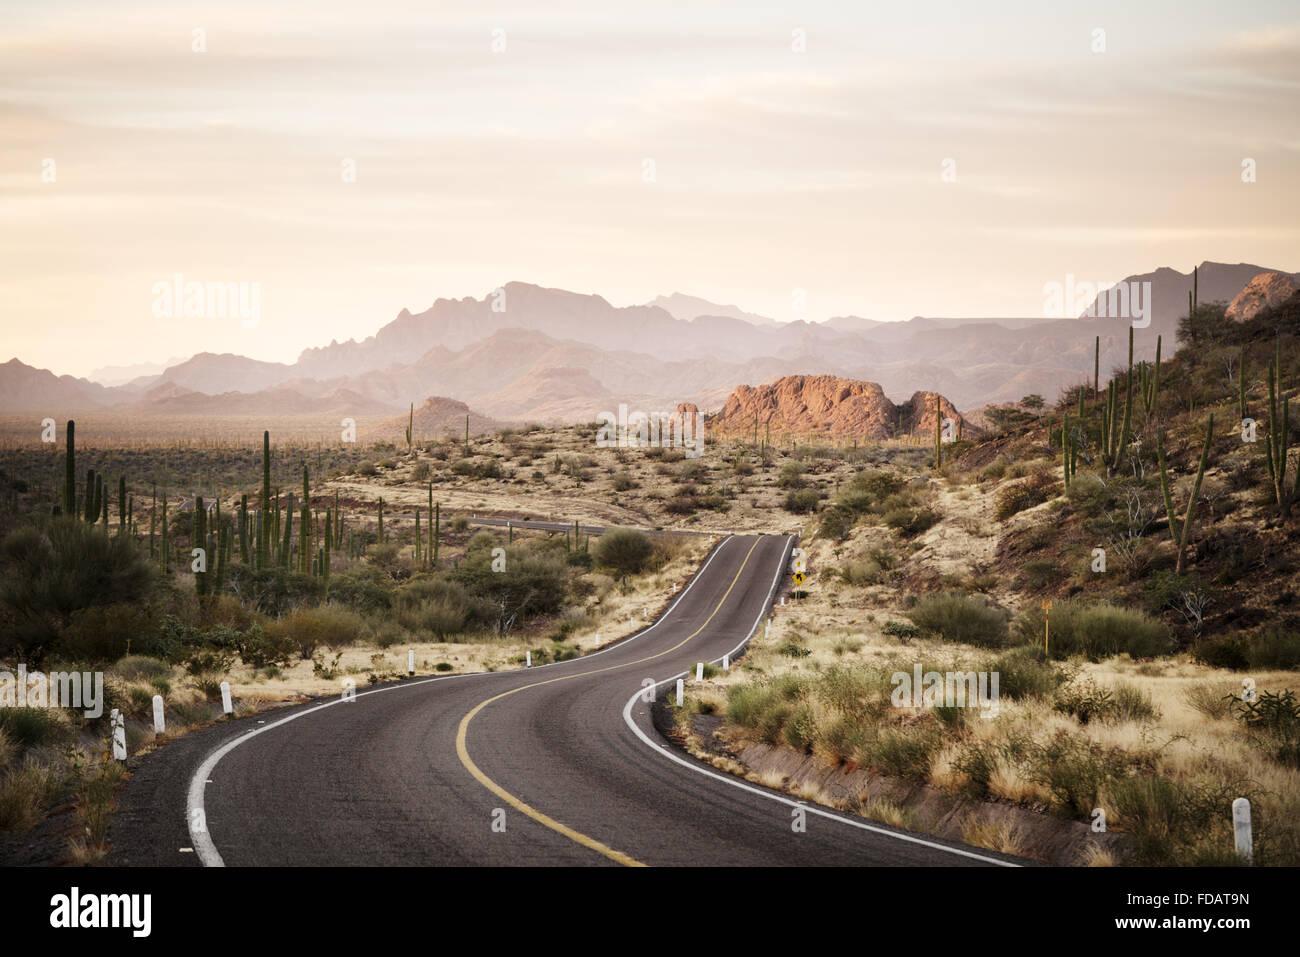 Winding road through the Mexican desert of Baja California - Stock Image